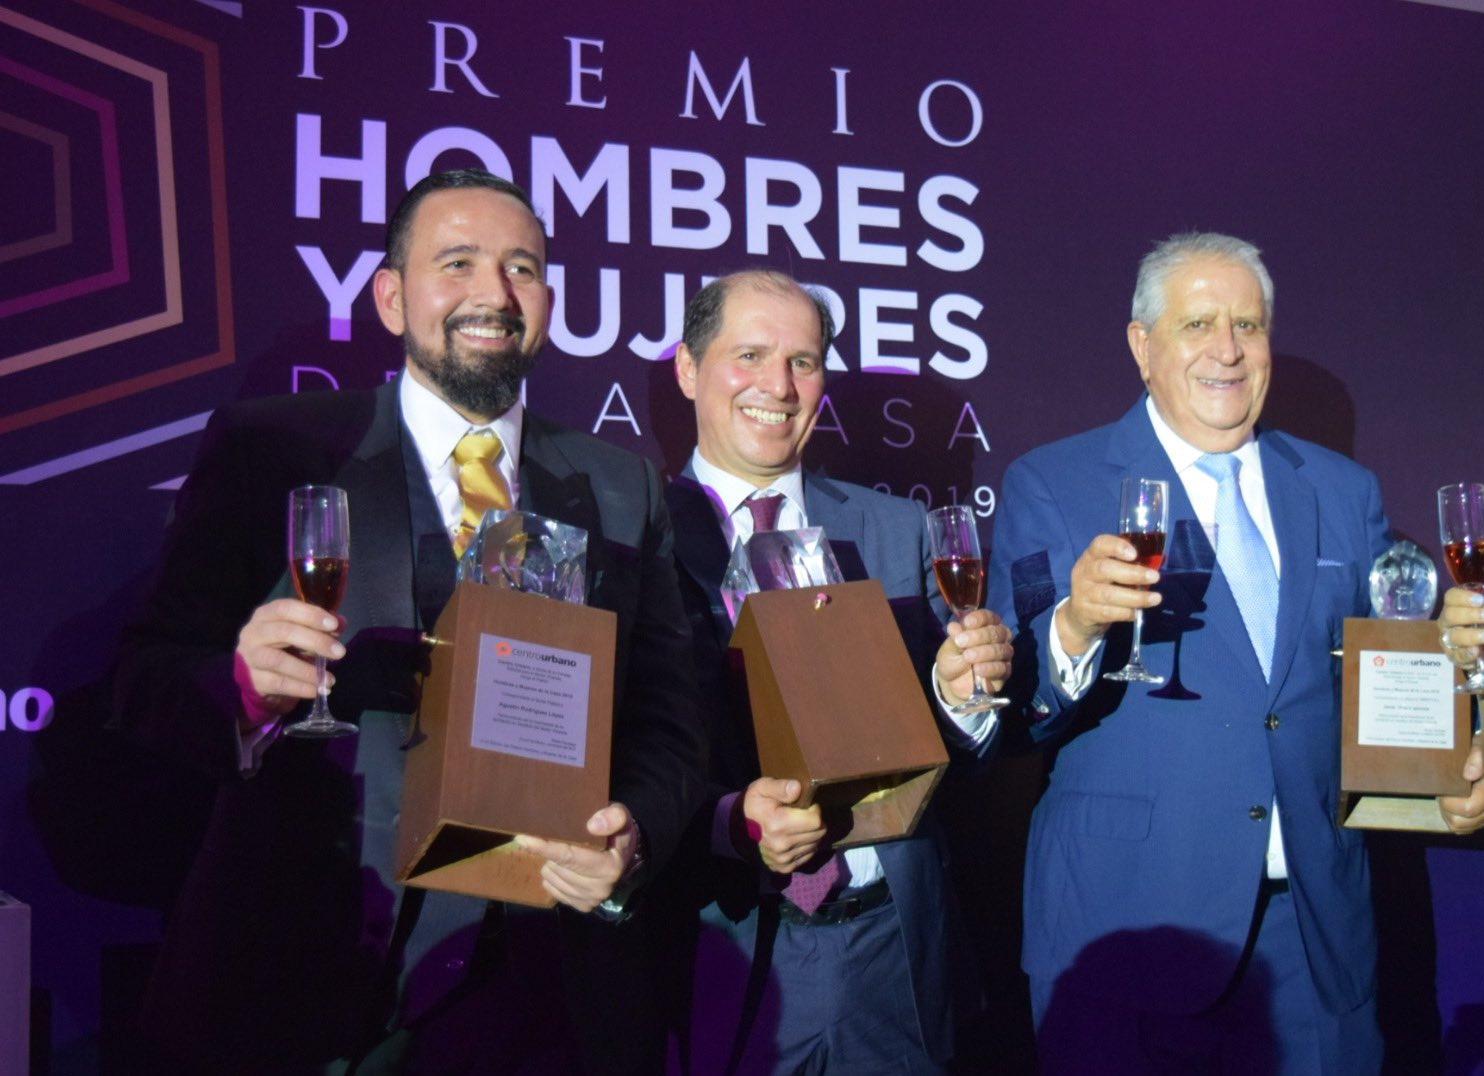 ▶️ Video | Premio HyM 2019: lo mejor de la industria de la vivienda